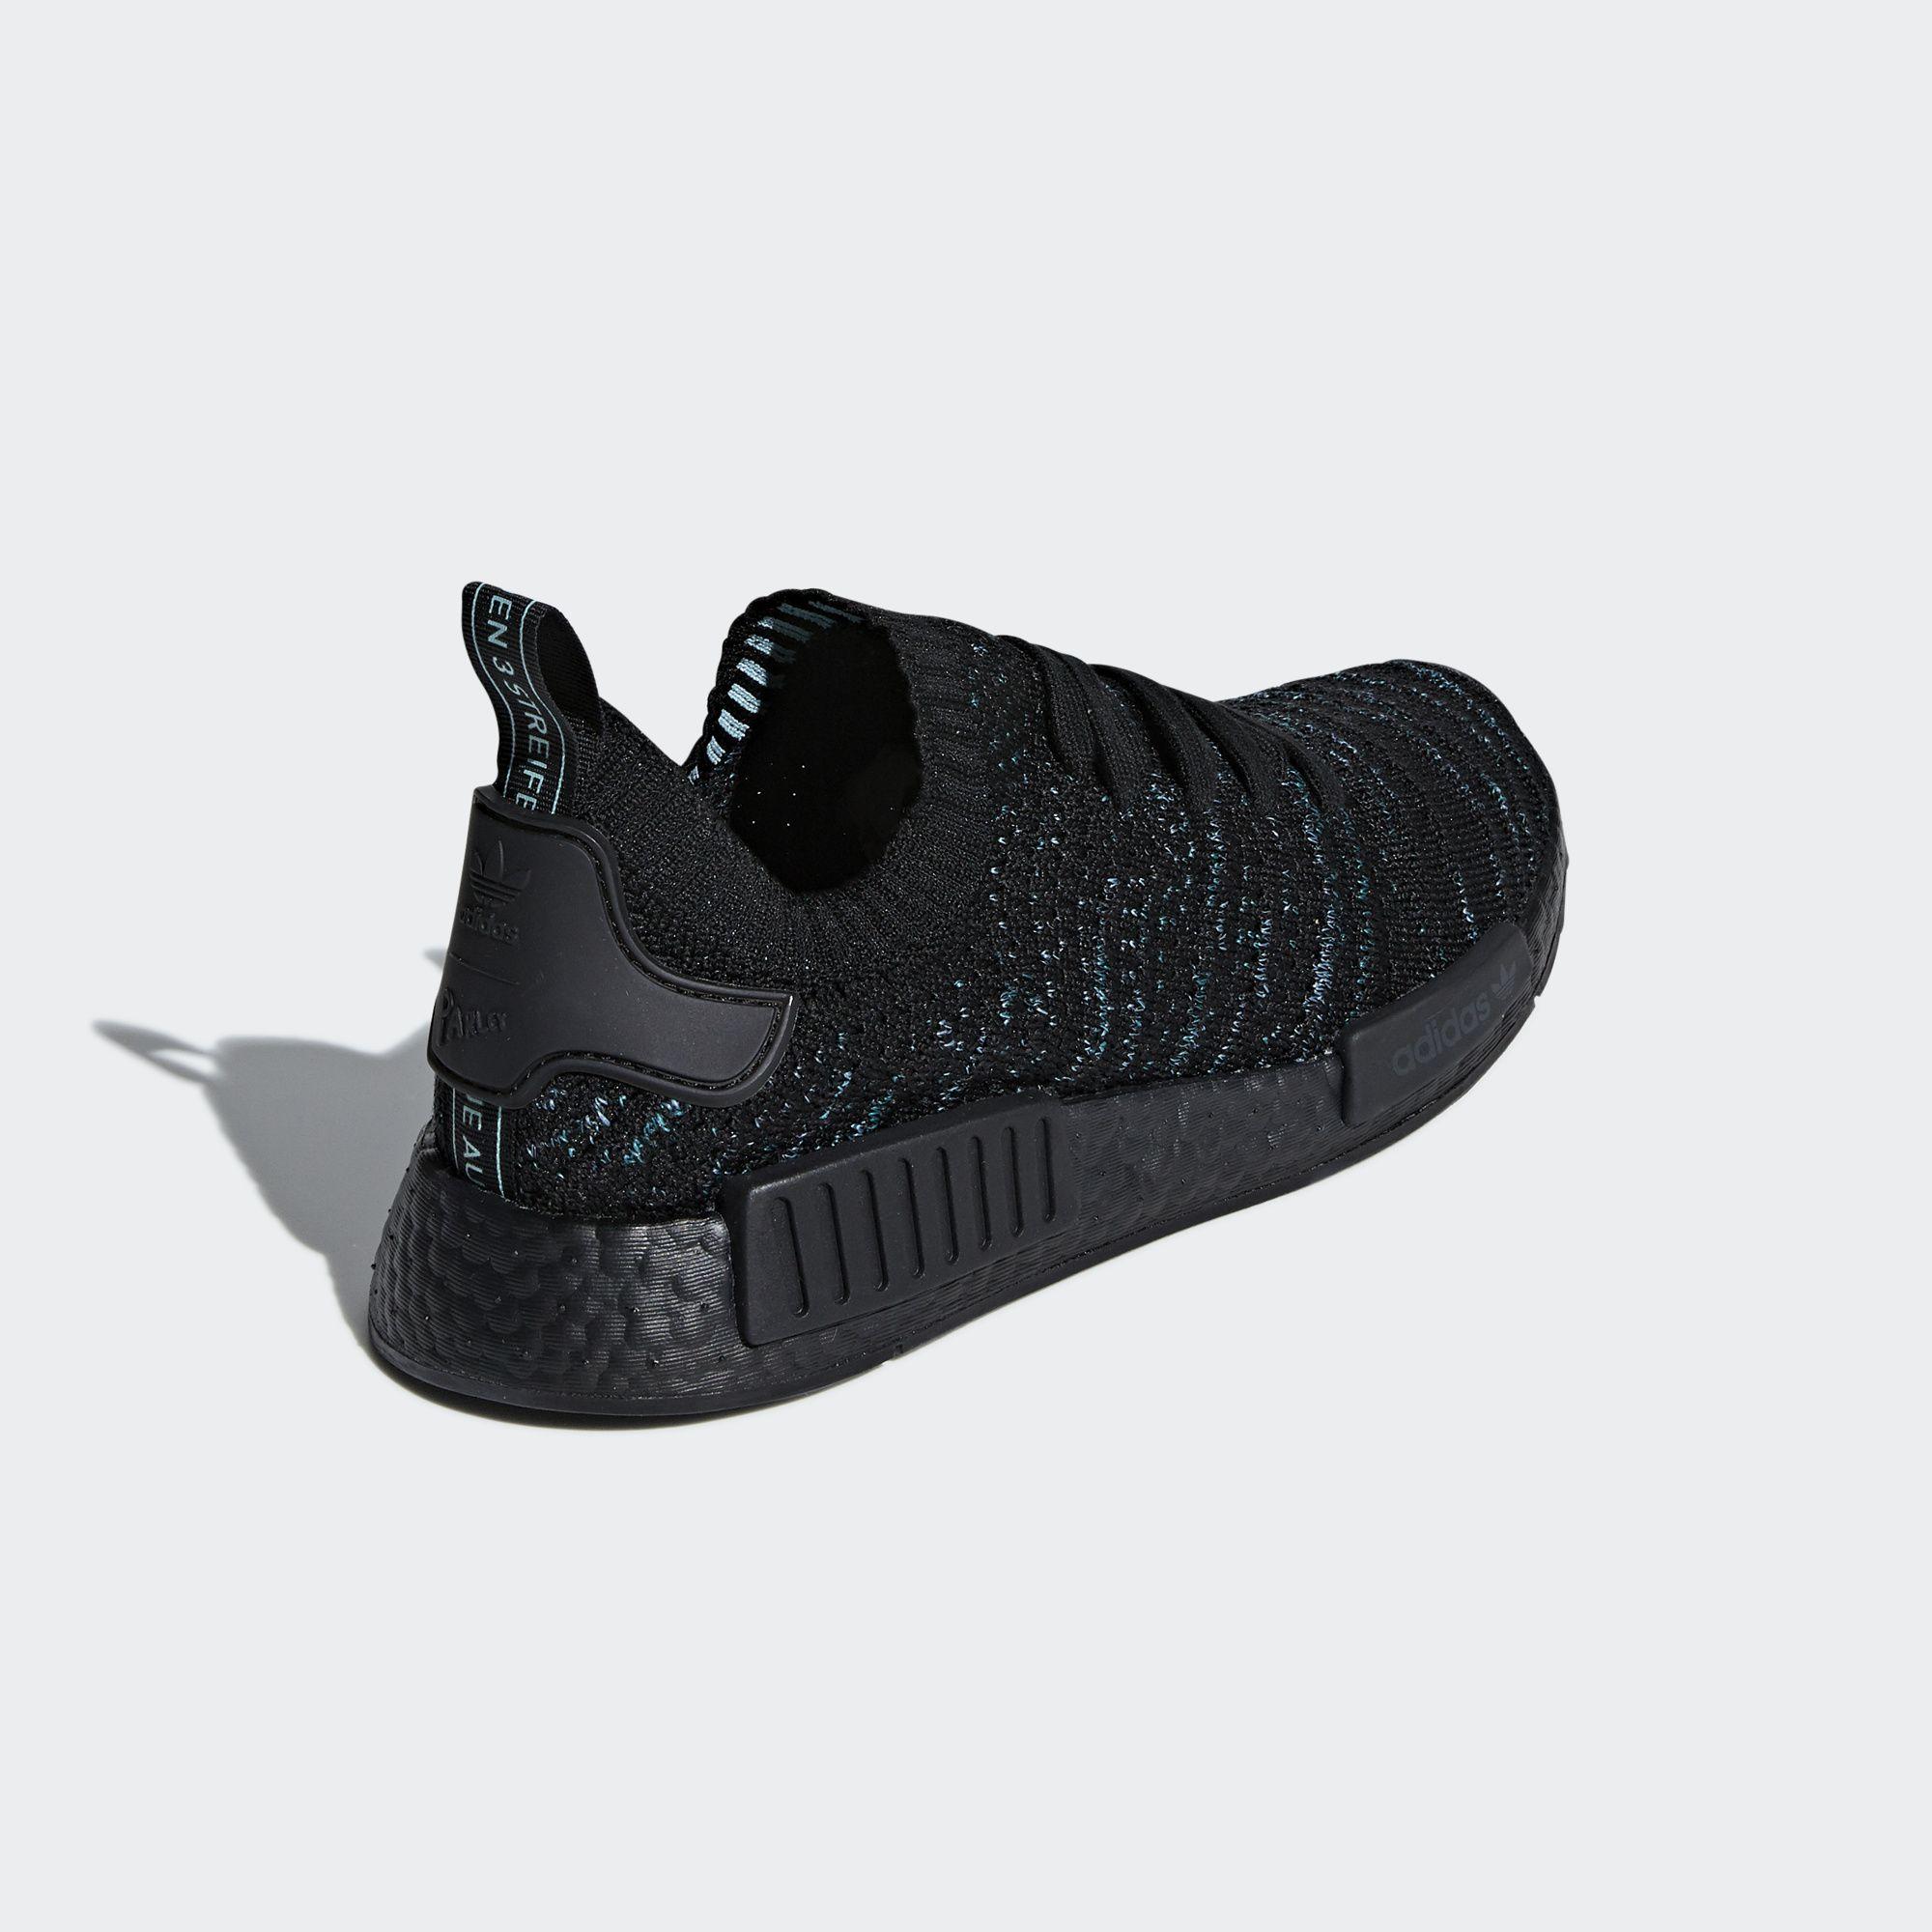 adidas ORIGINALS NMD_R1 STLT X PARLEY 4